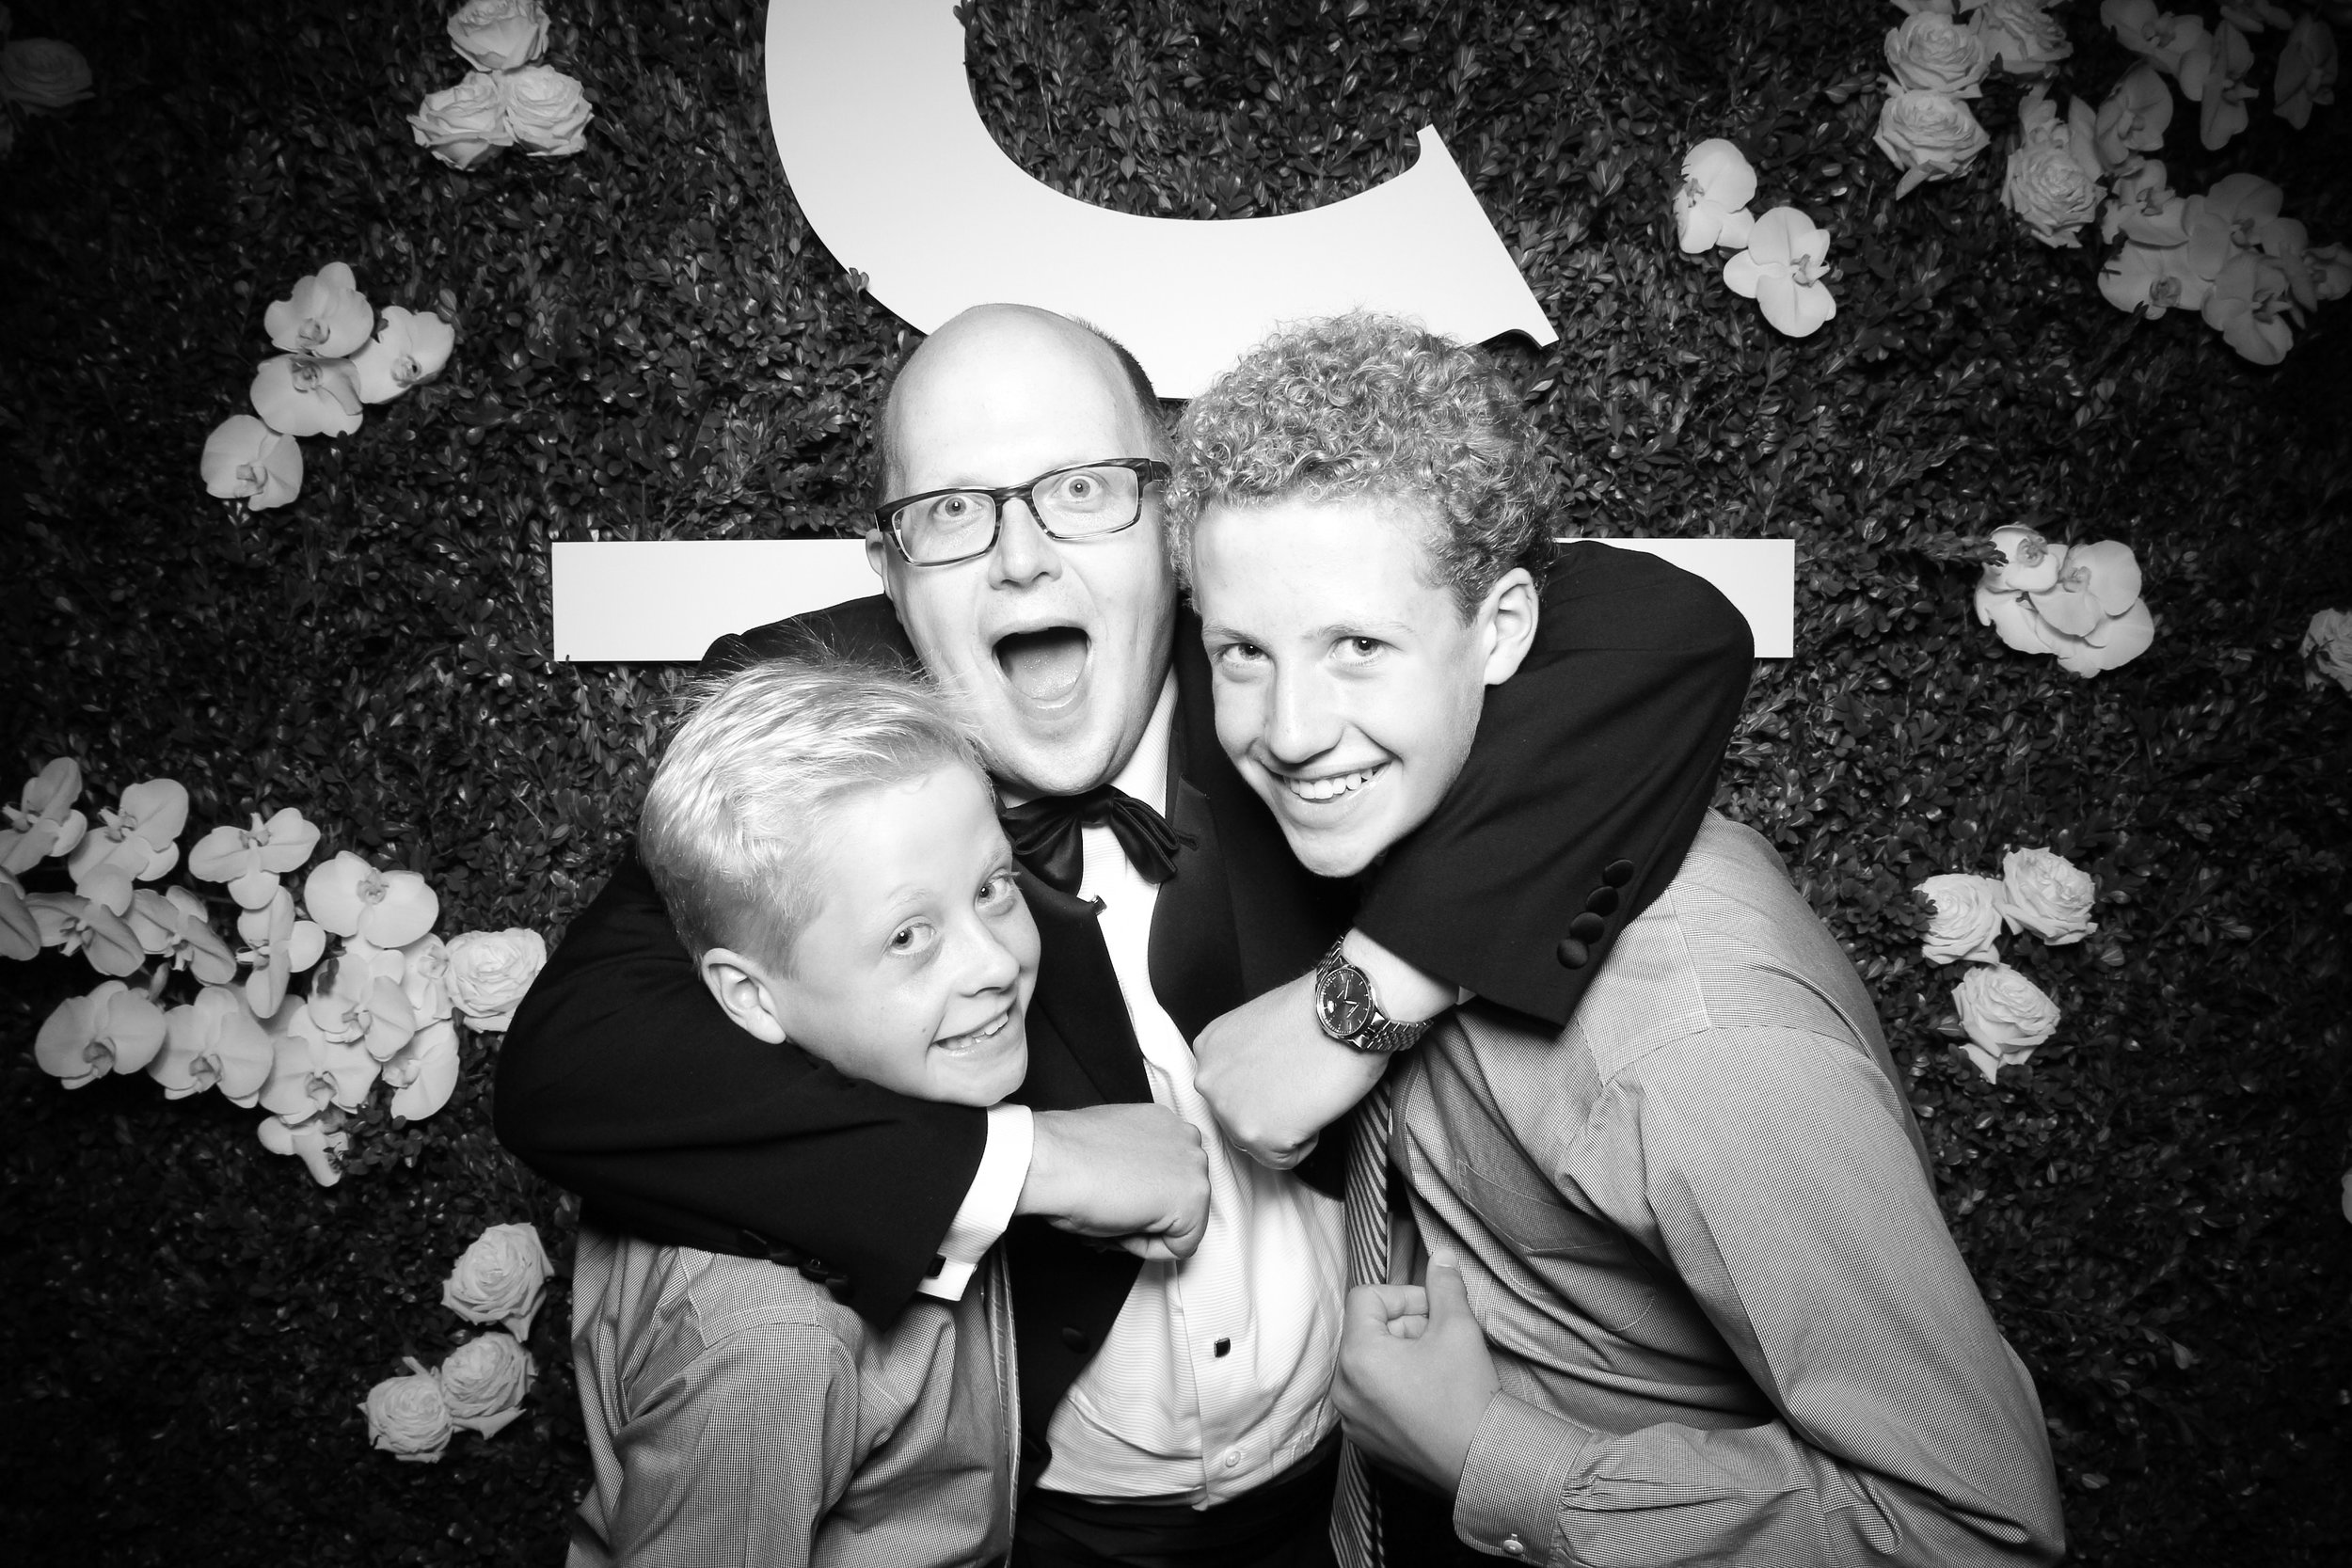 Peninsula_Hotel_Chicago_Wedding_Photo_Booth_22.jpg